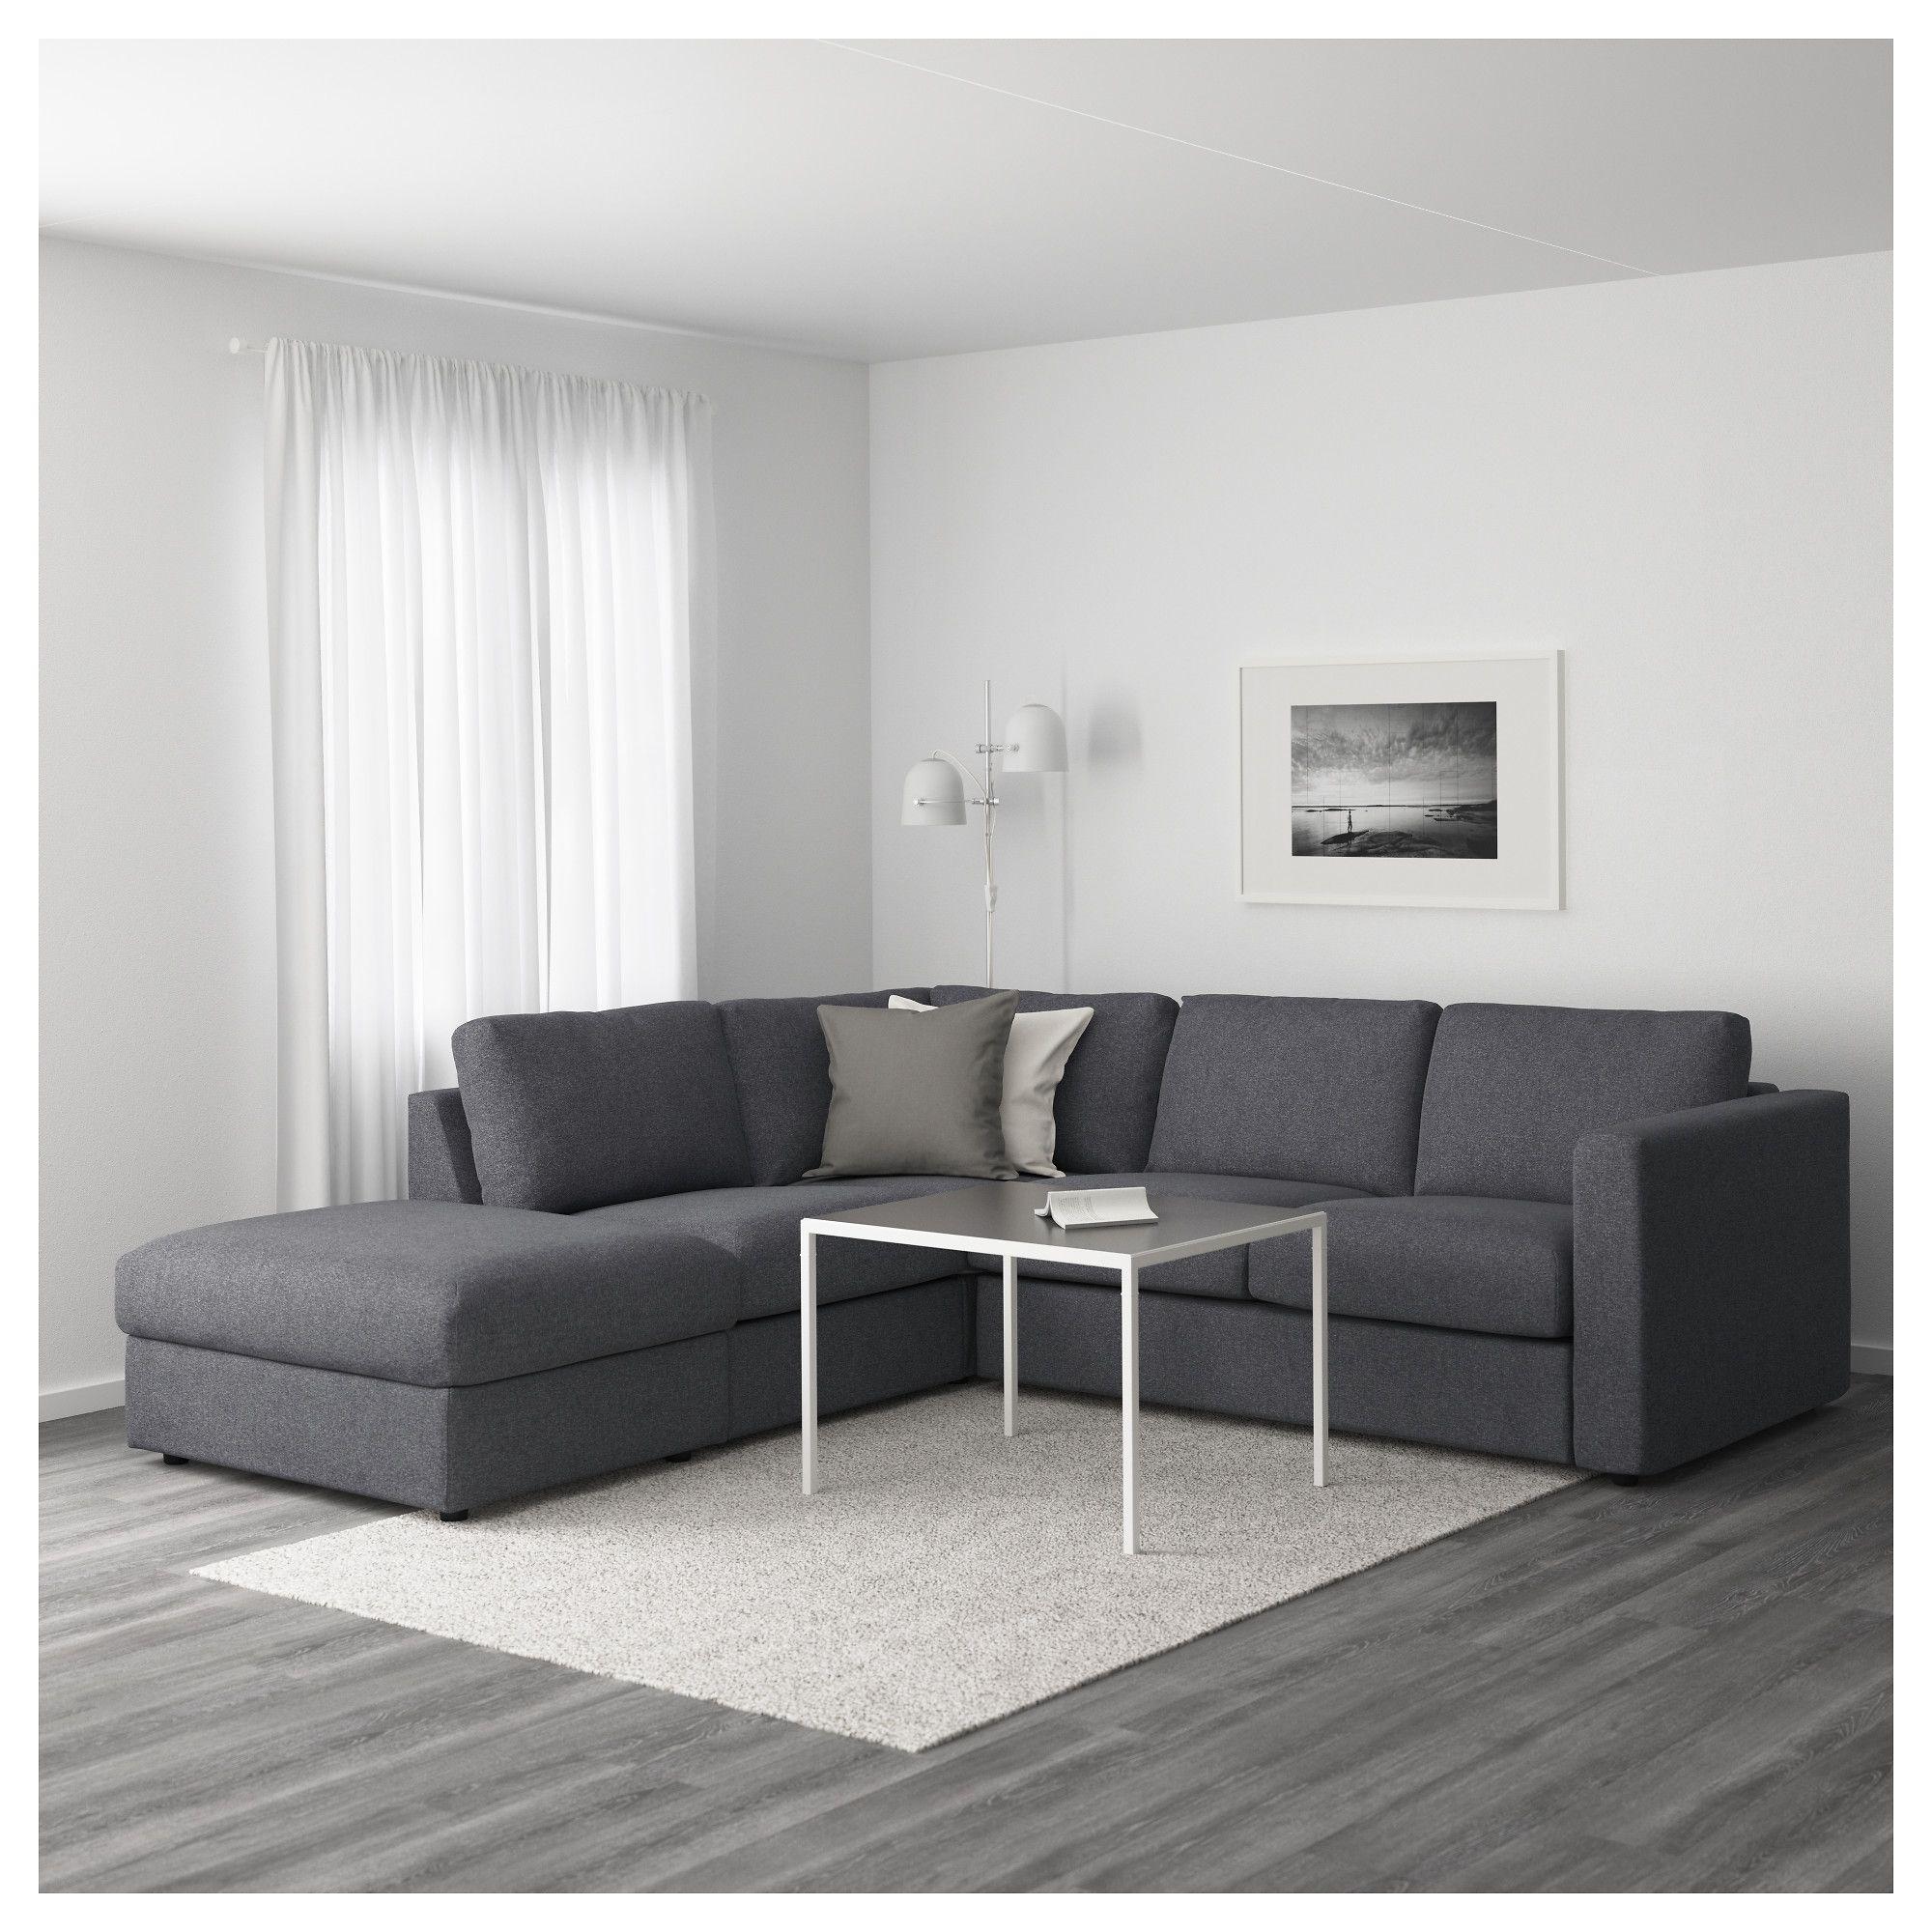 Furniture And Home Furnishings Ikea Vimle Sectional Sofa Best Leather Sofa